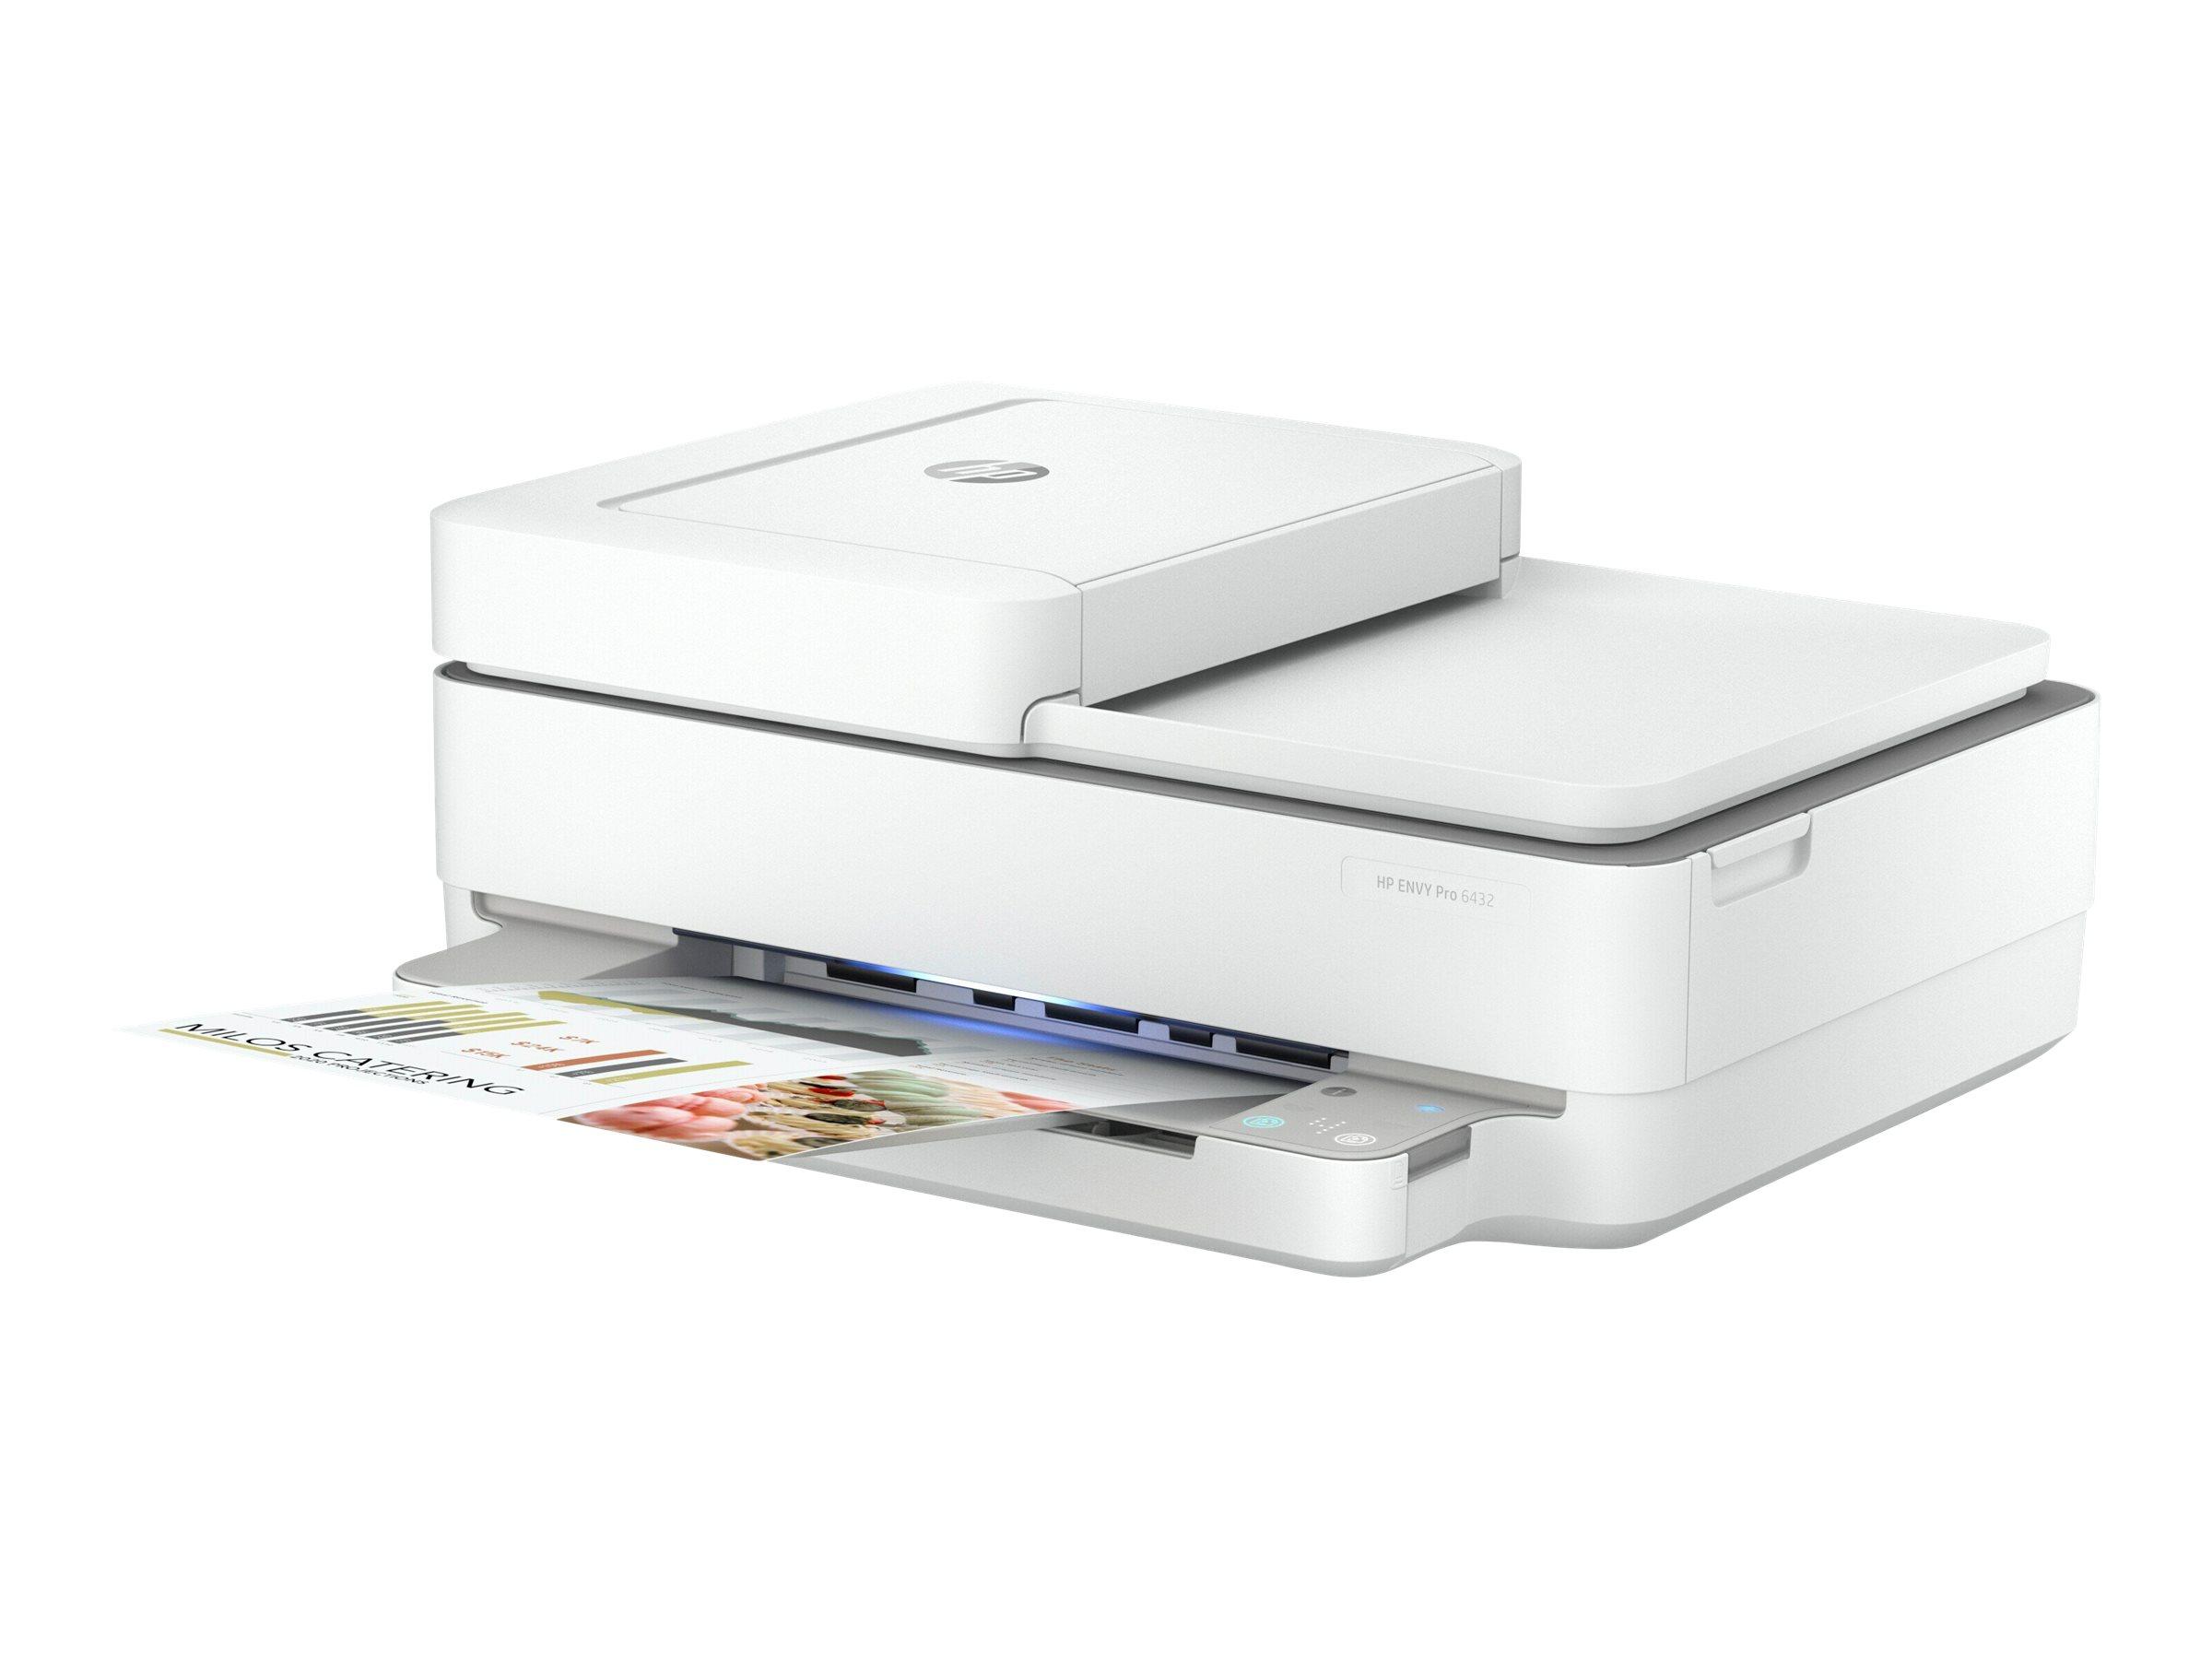 HP ENVY Pro 6432 All-in-One - Multifunktionsdrucker - Farbe - Tintenstrahl - 216 x 297 mm (Original) - A4/Letter (Medien)